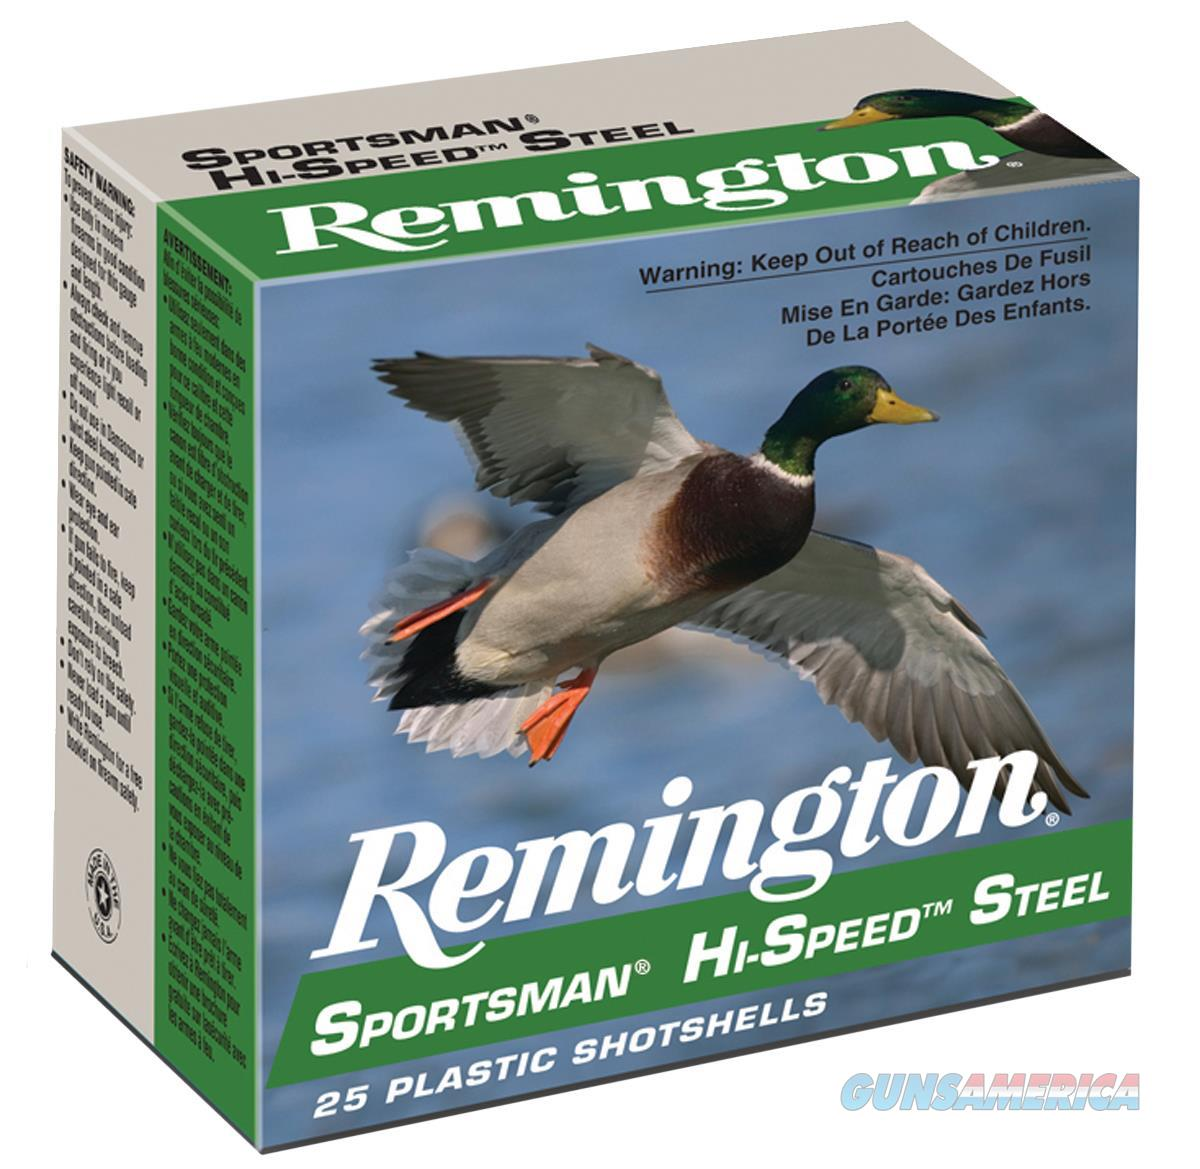 "Remington Ammo Hi-Speed Steel 25-Pk 12Ga. 3"" 1550Fps. 1-1/8Oz. #2 SSTHV12H2  Non-Guns > Ammunition"